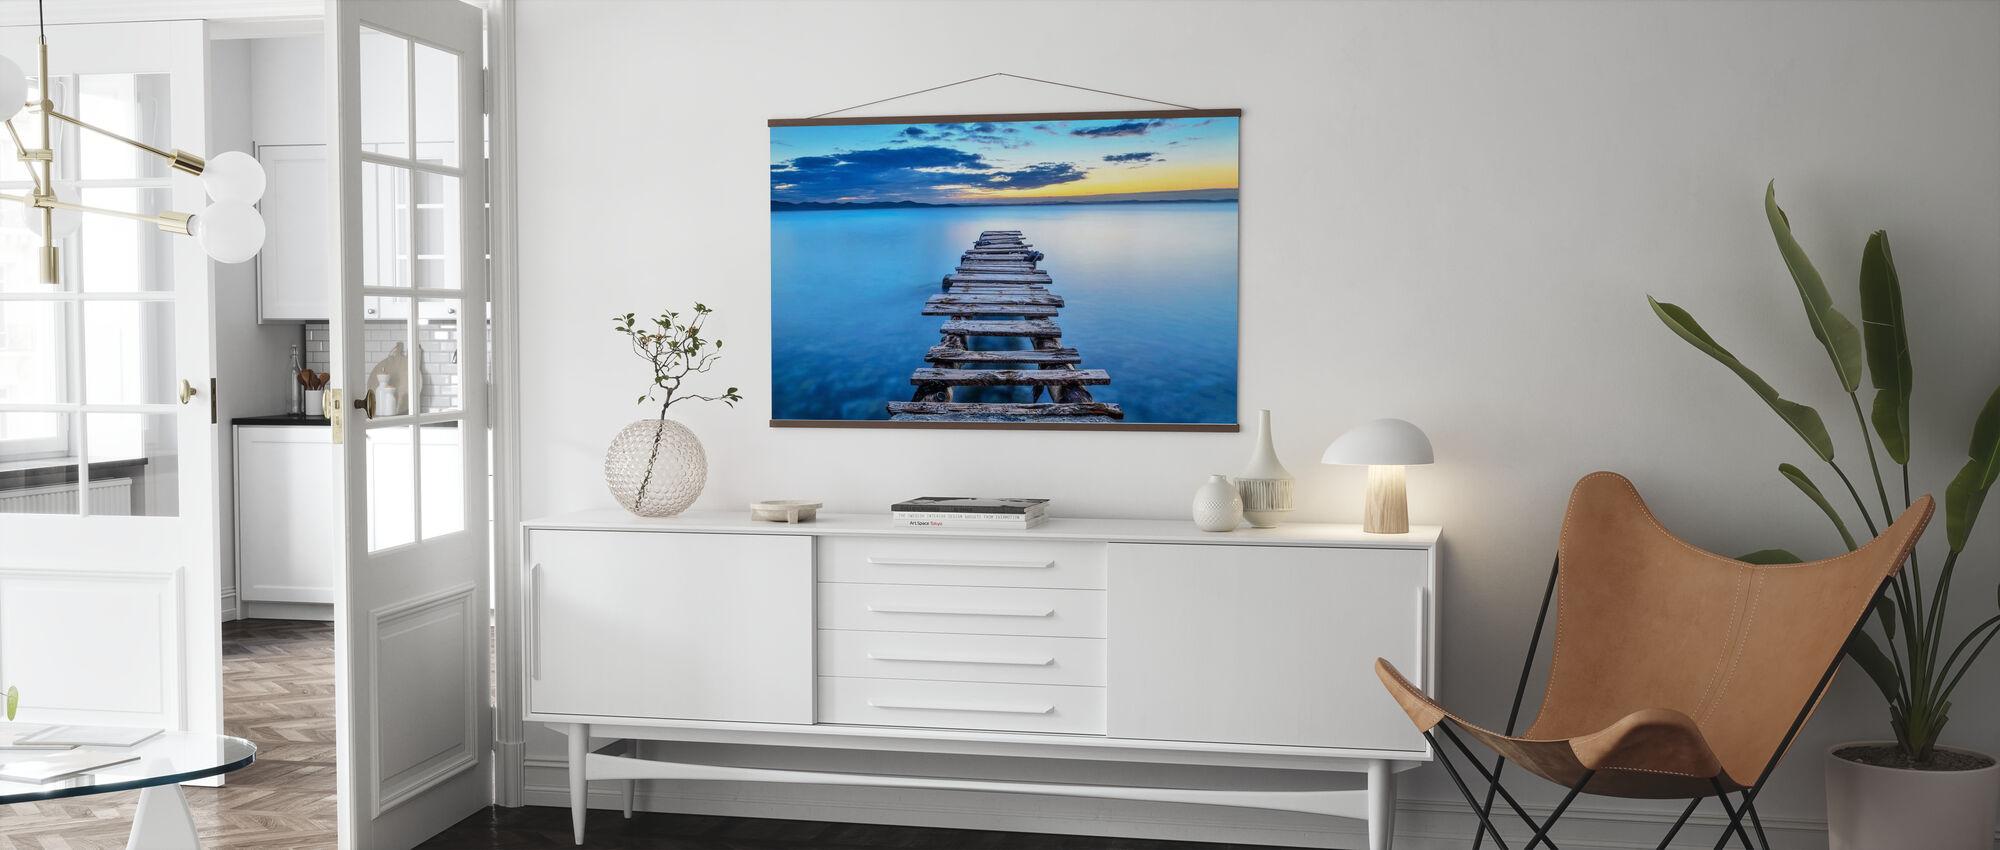 Pier - Poster - Living Room